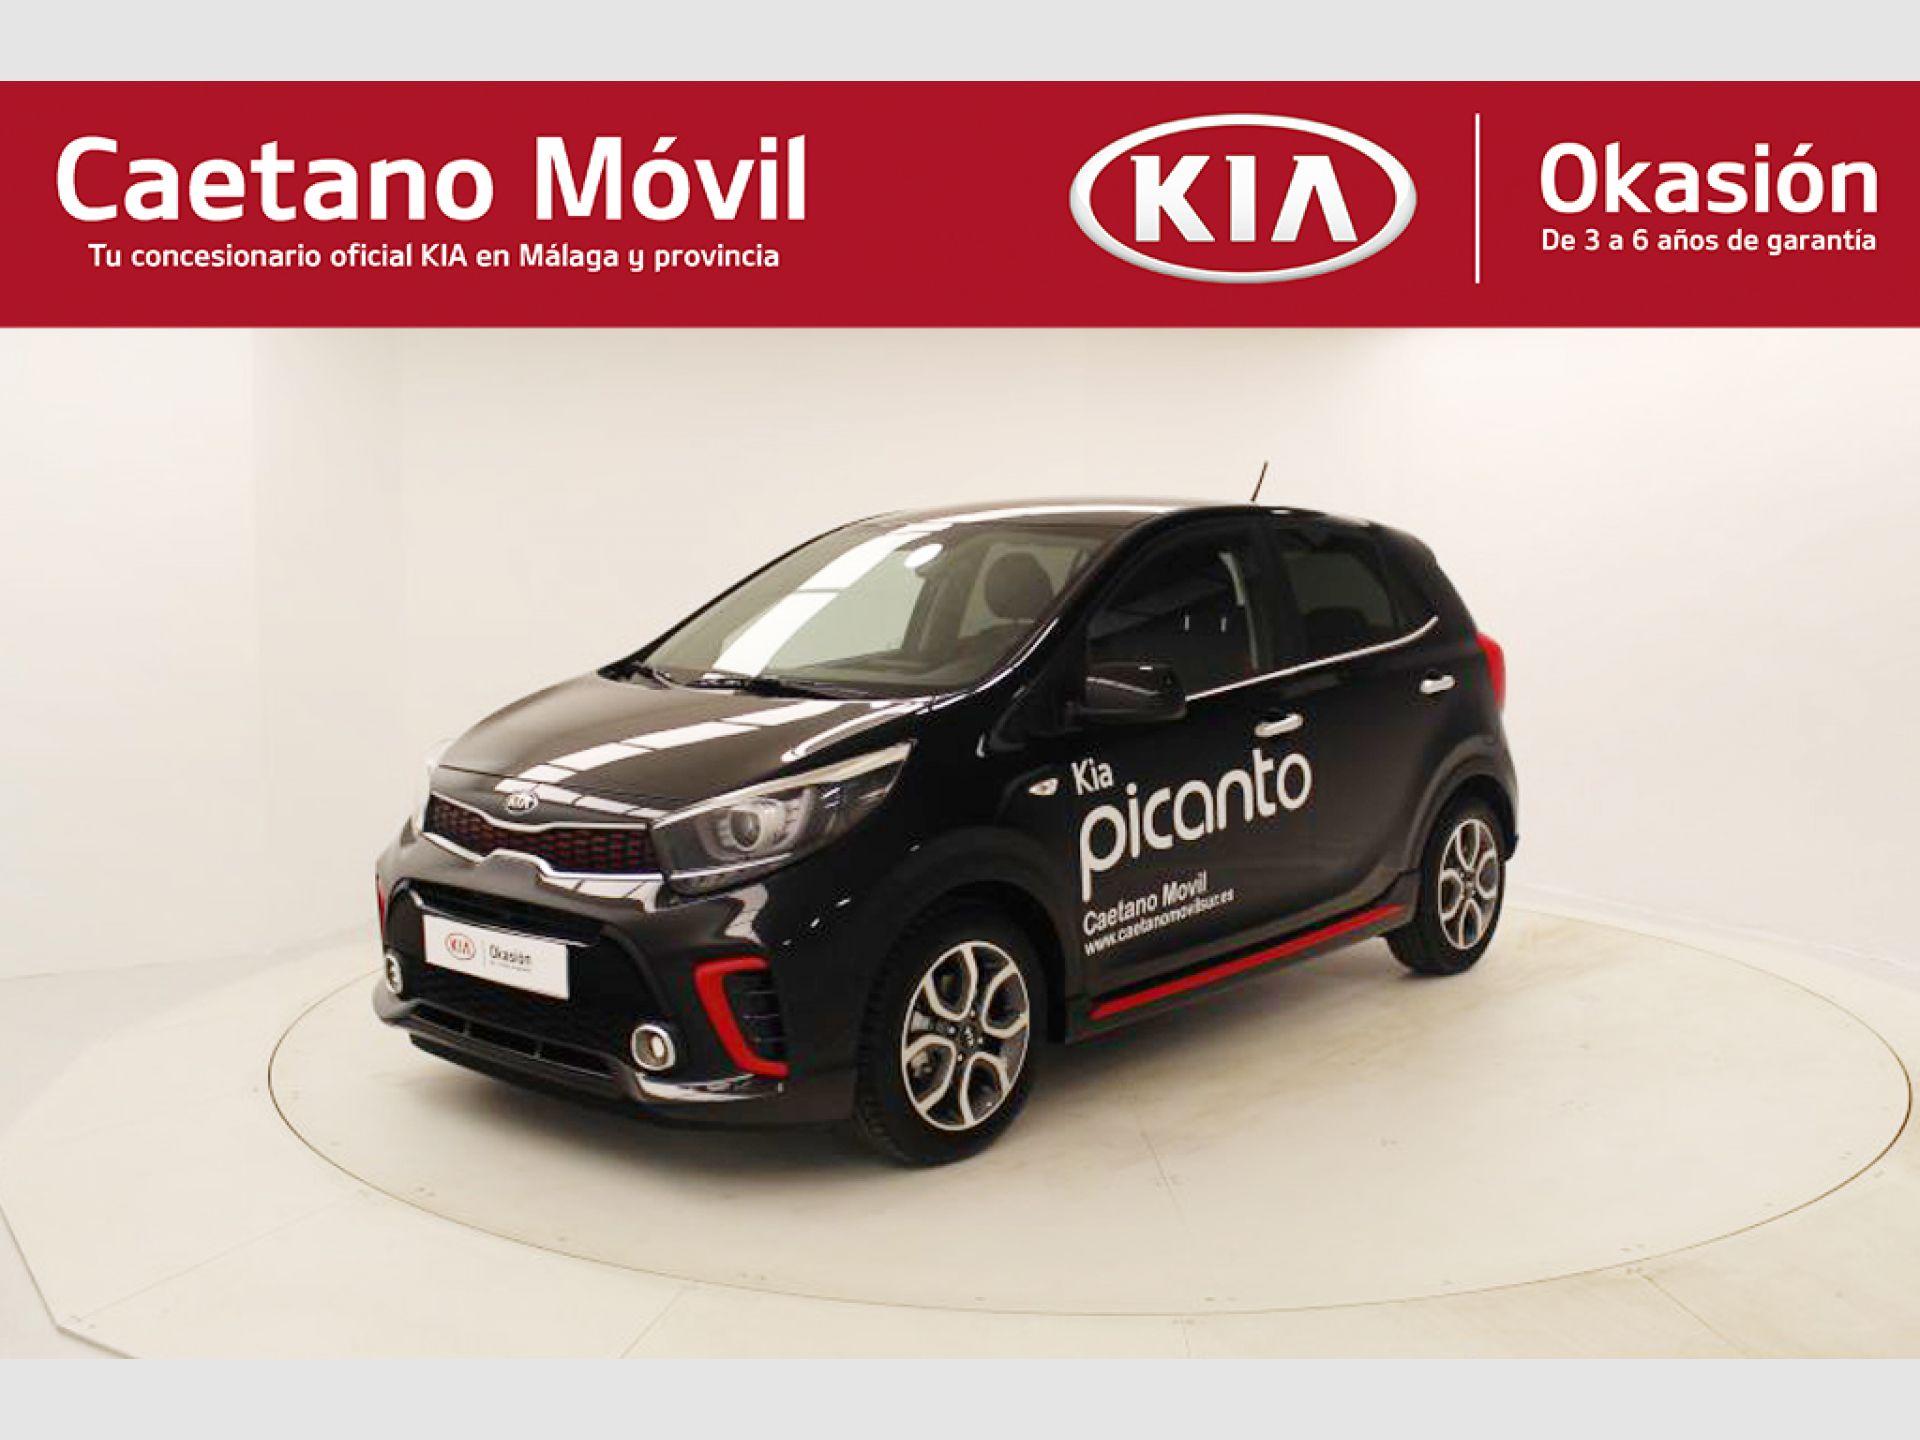 Kia Picanto 1.2 CVVT 62kW (84CV) GT Line segunda mano Málaga